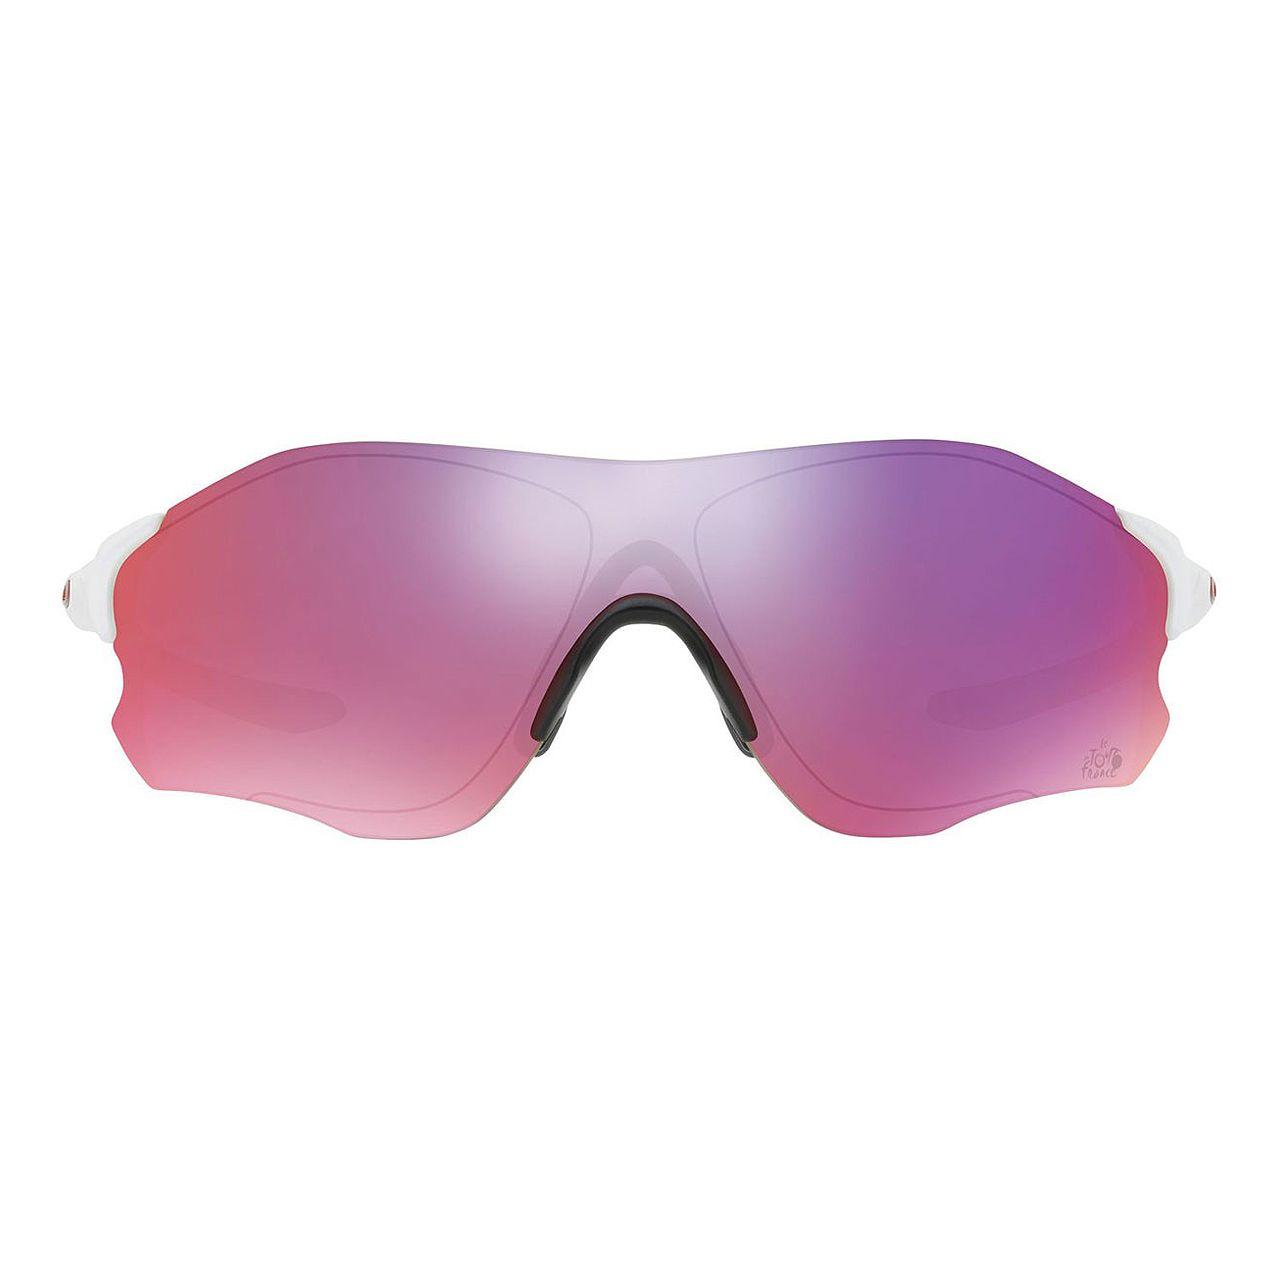 عینک آفتابی اوکلی مدل EVZero Path Tour de France کد OO9308-1938 -  - 2